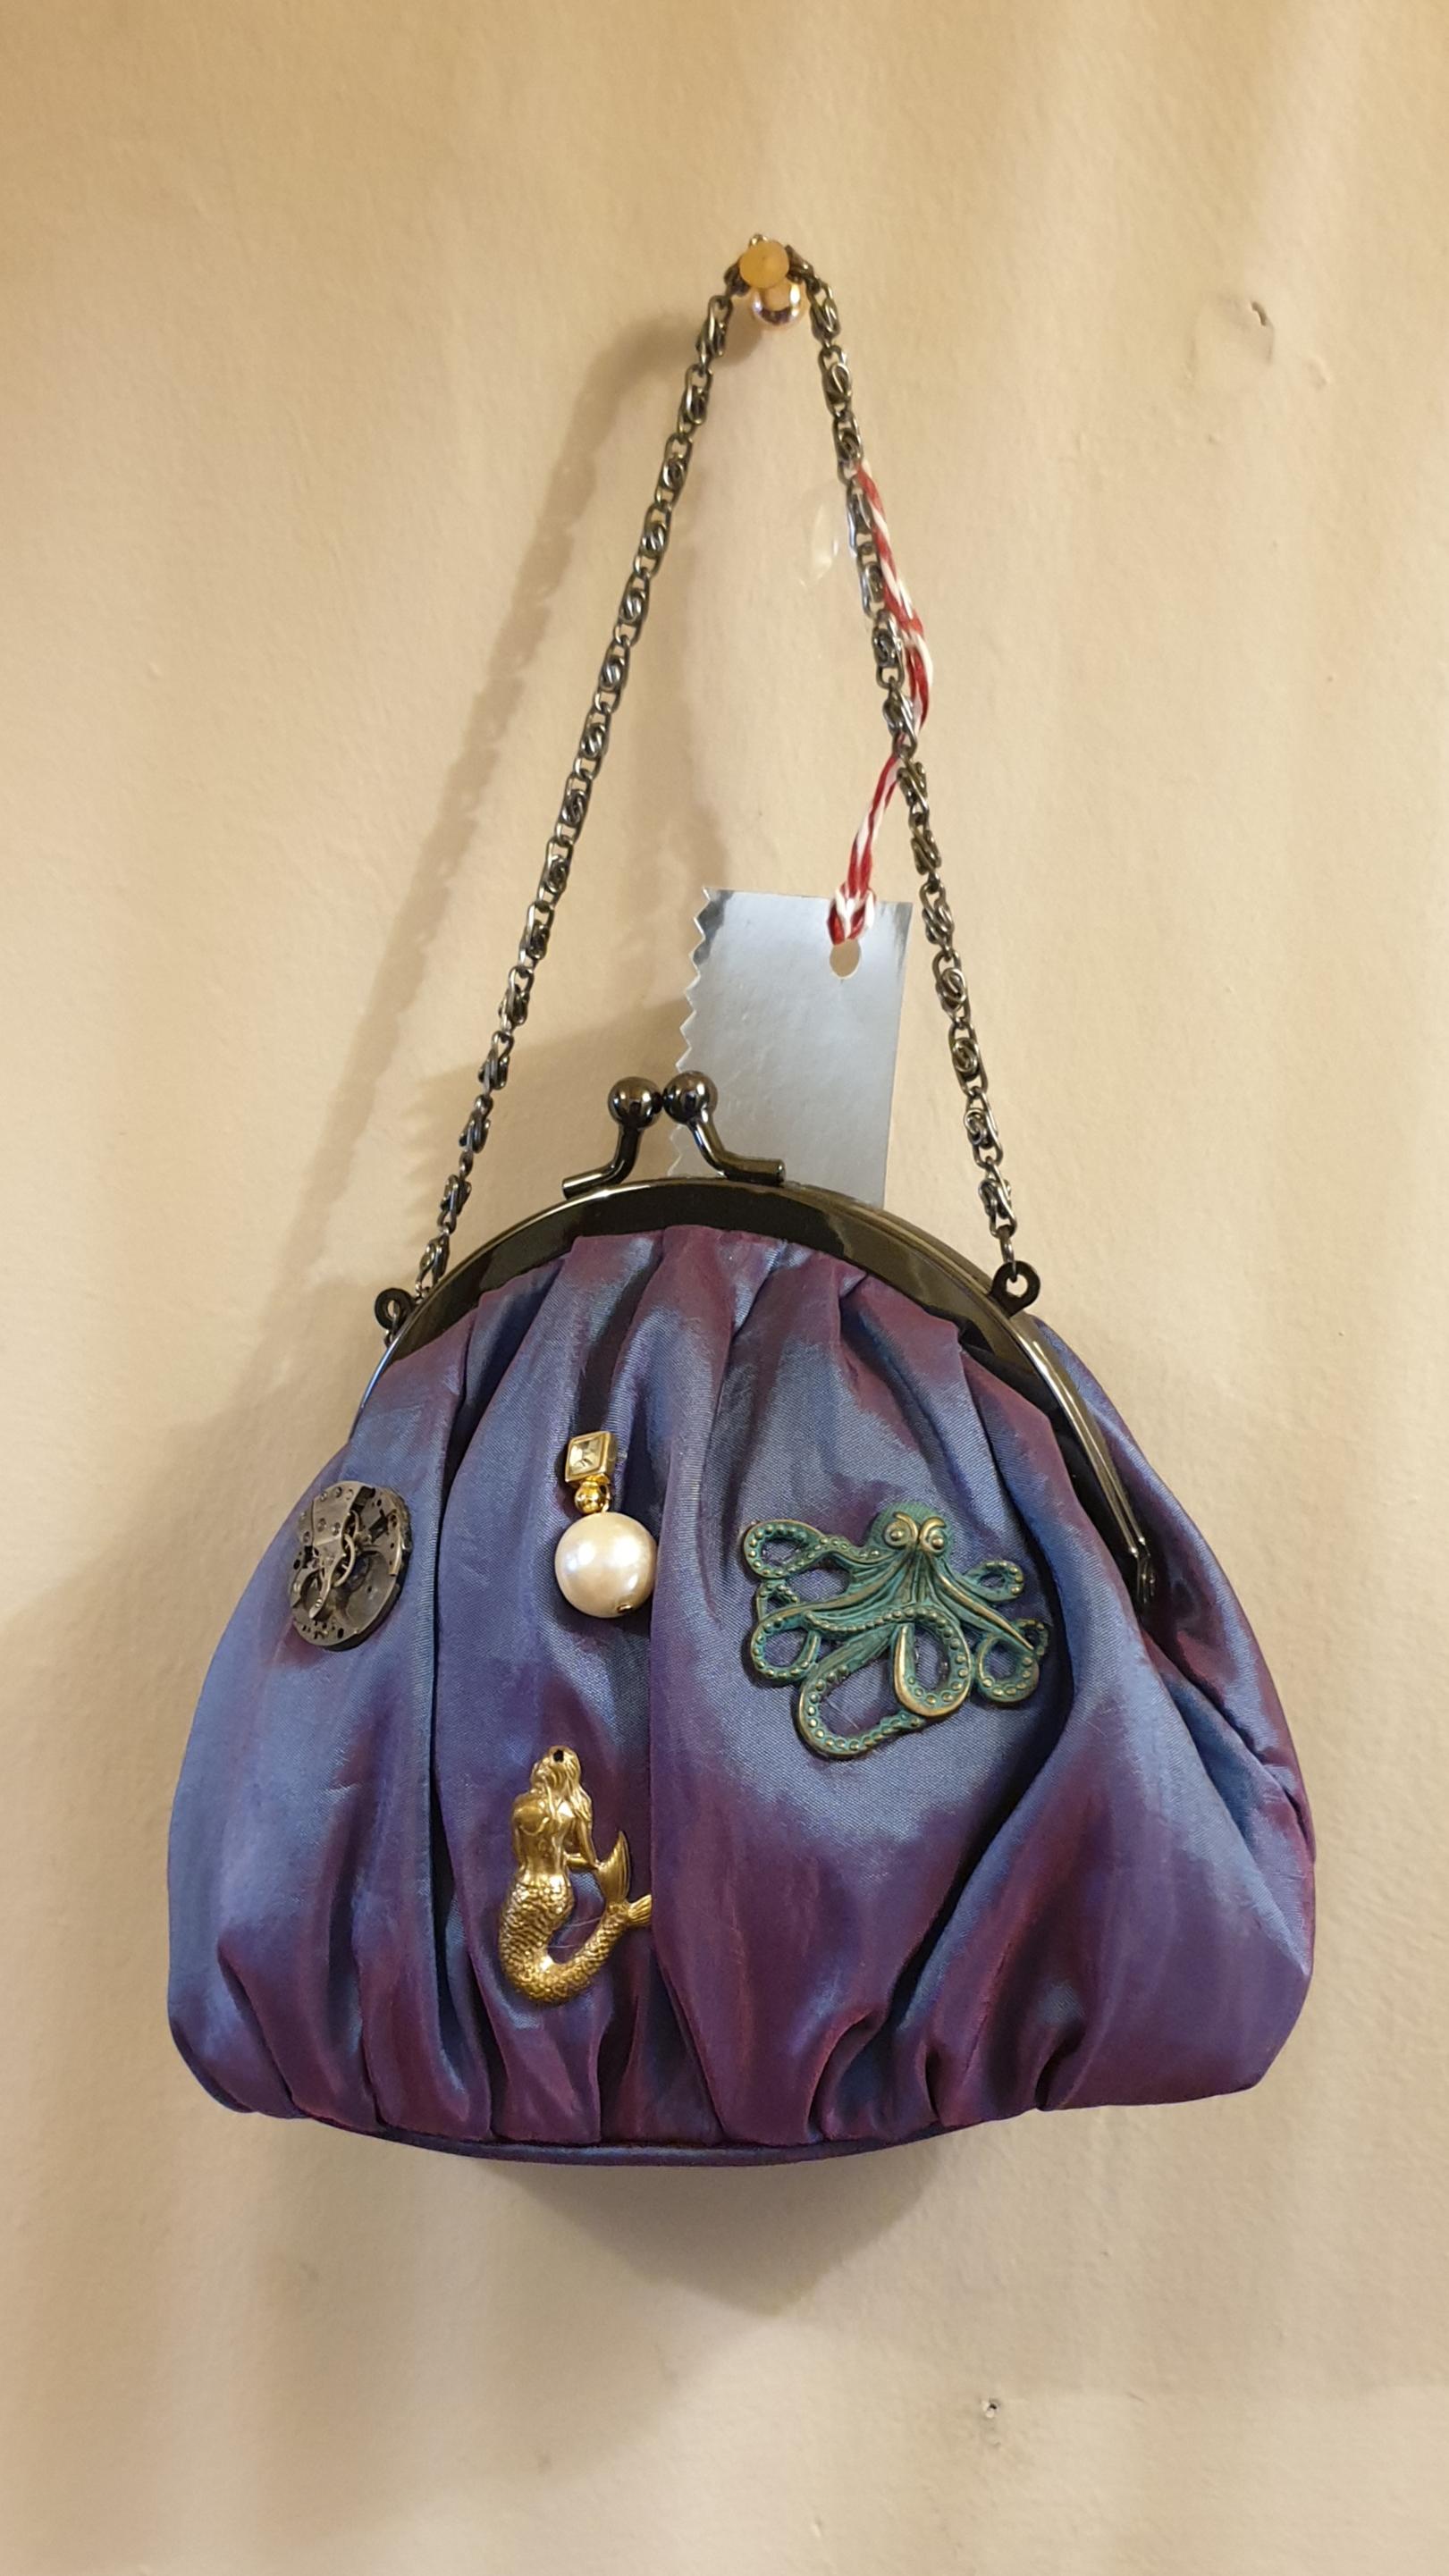 Wrist Bag With Undersea Theme.